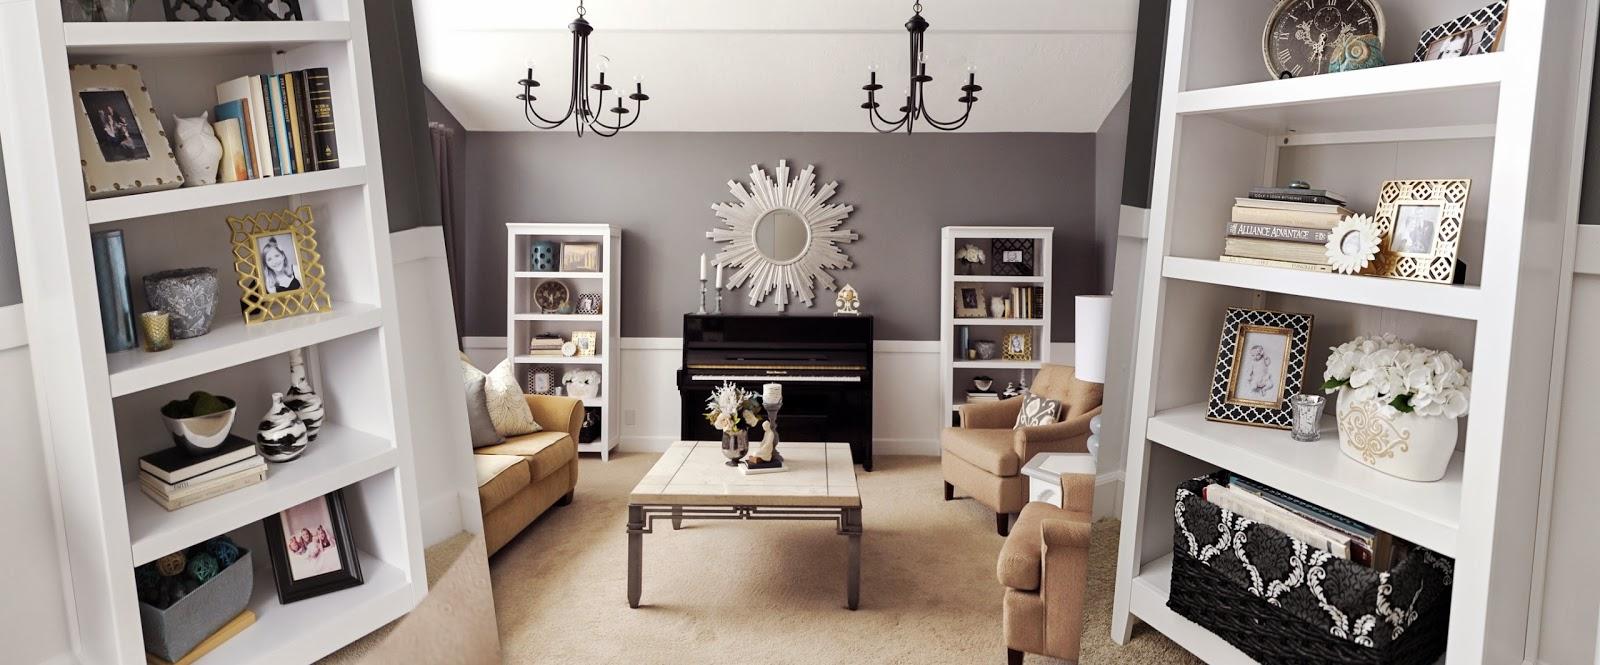 the best attitude 9cfc7 f6ef2 Studio 7 Interior Design: How to Stage a Bookcase